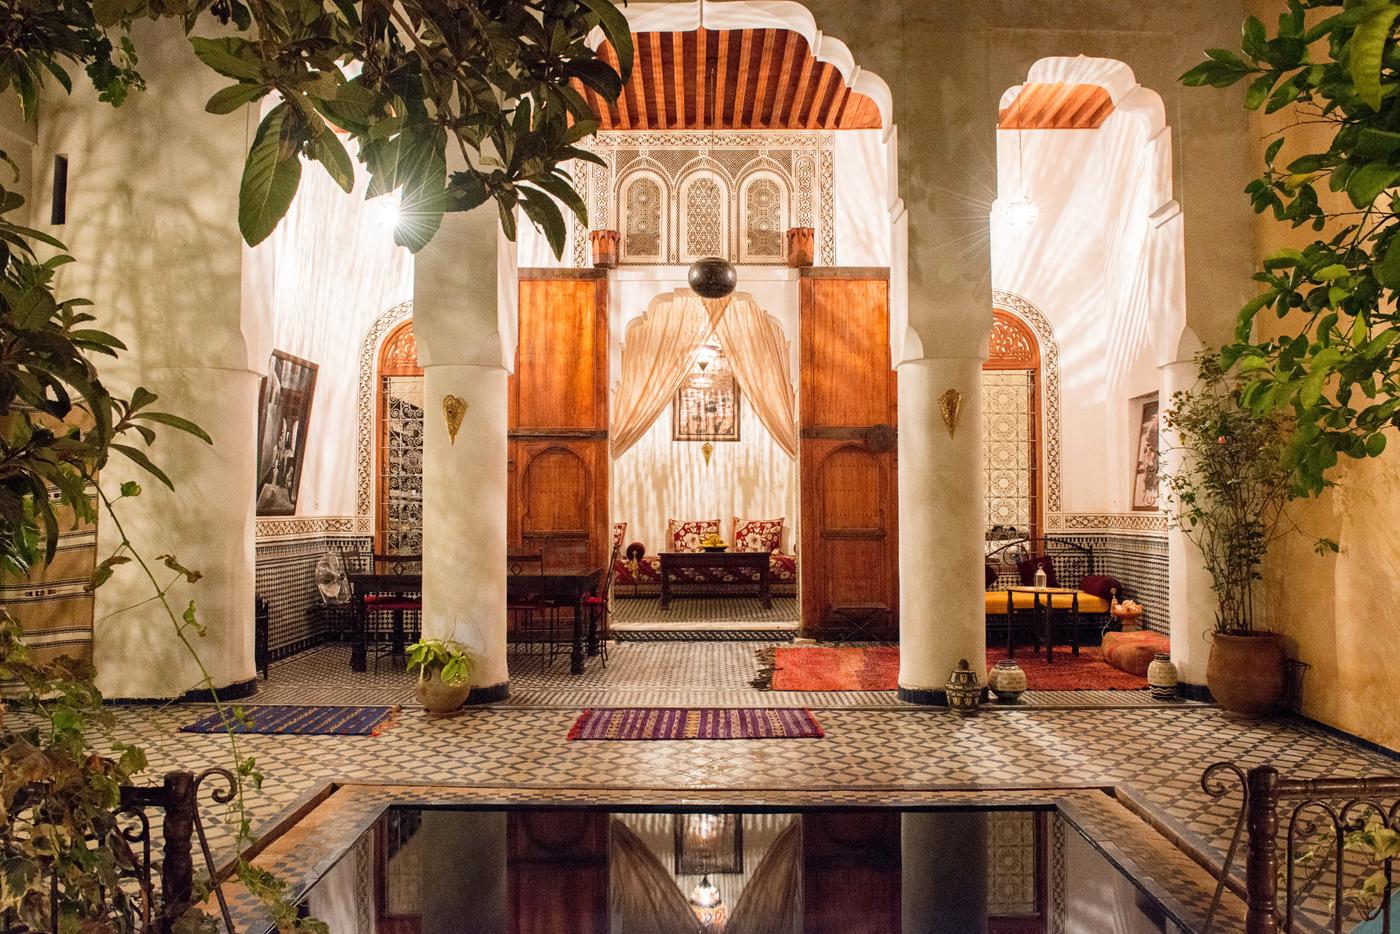 ThePerfectHideaway_Riad Fez Medina01.jpg